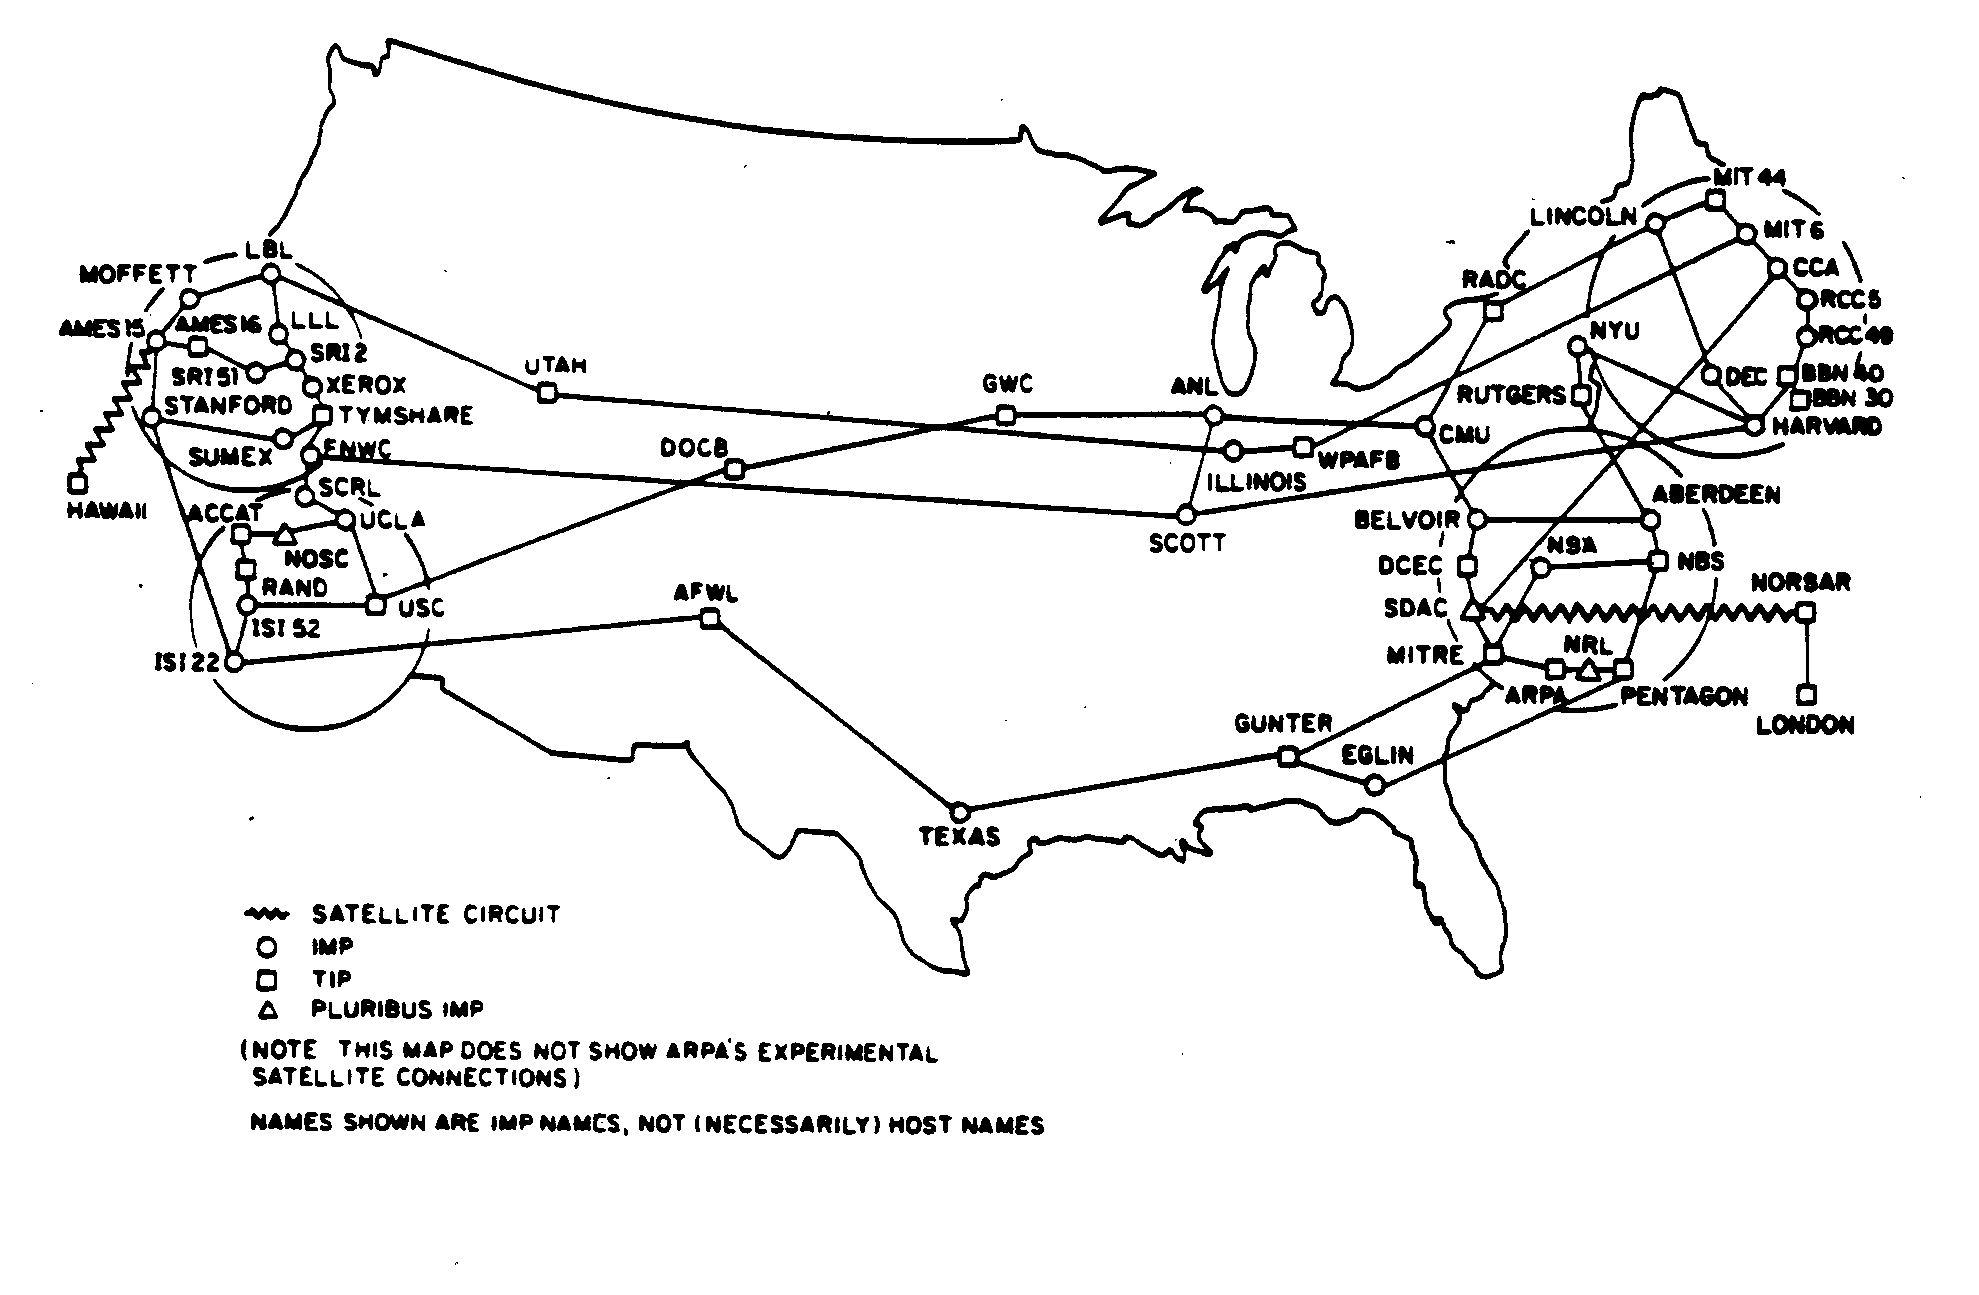 ARPANET Maps